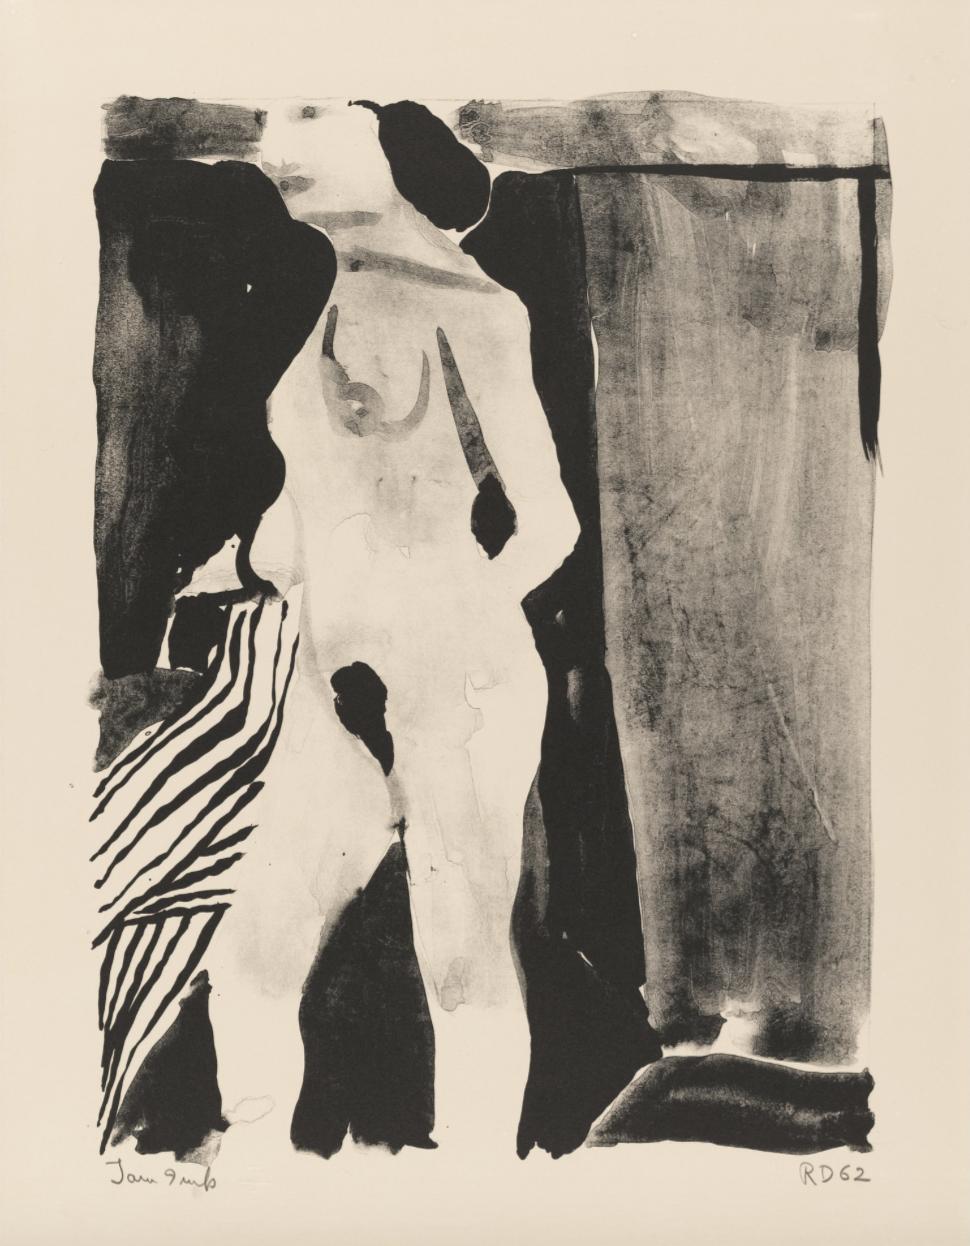 Richard Diebenkorn,  Nude,  1962, lithograph